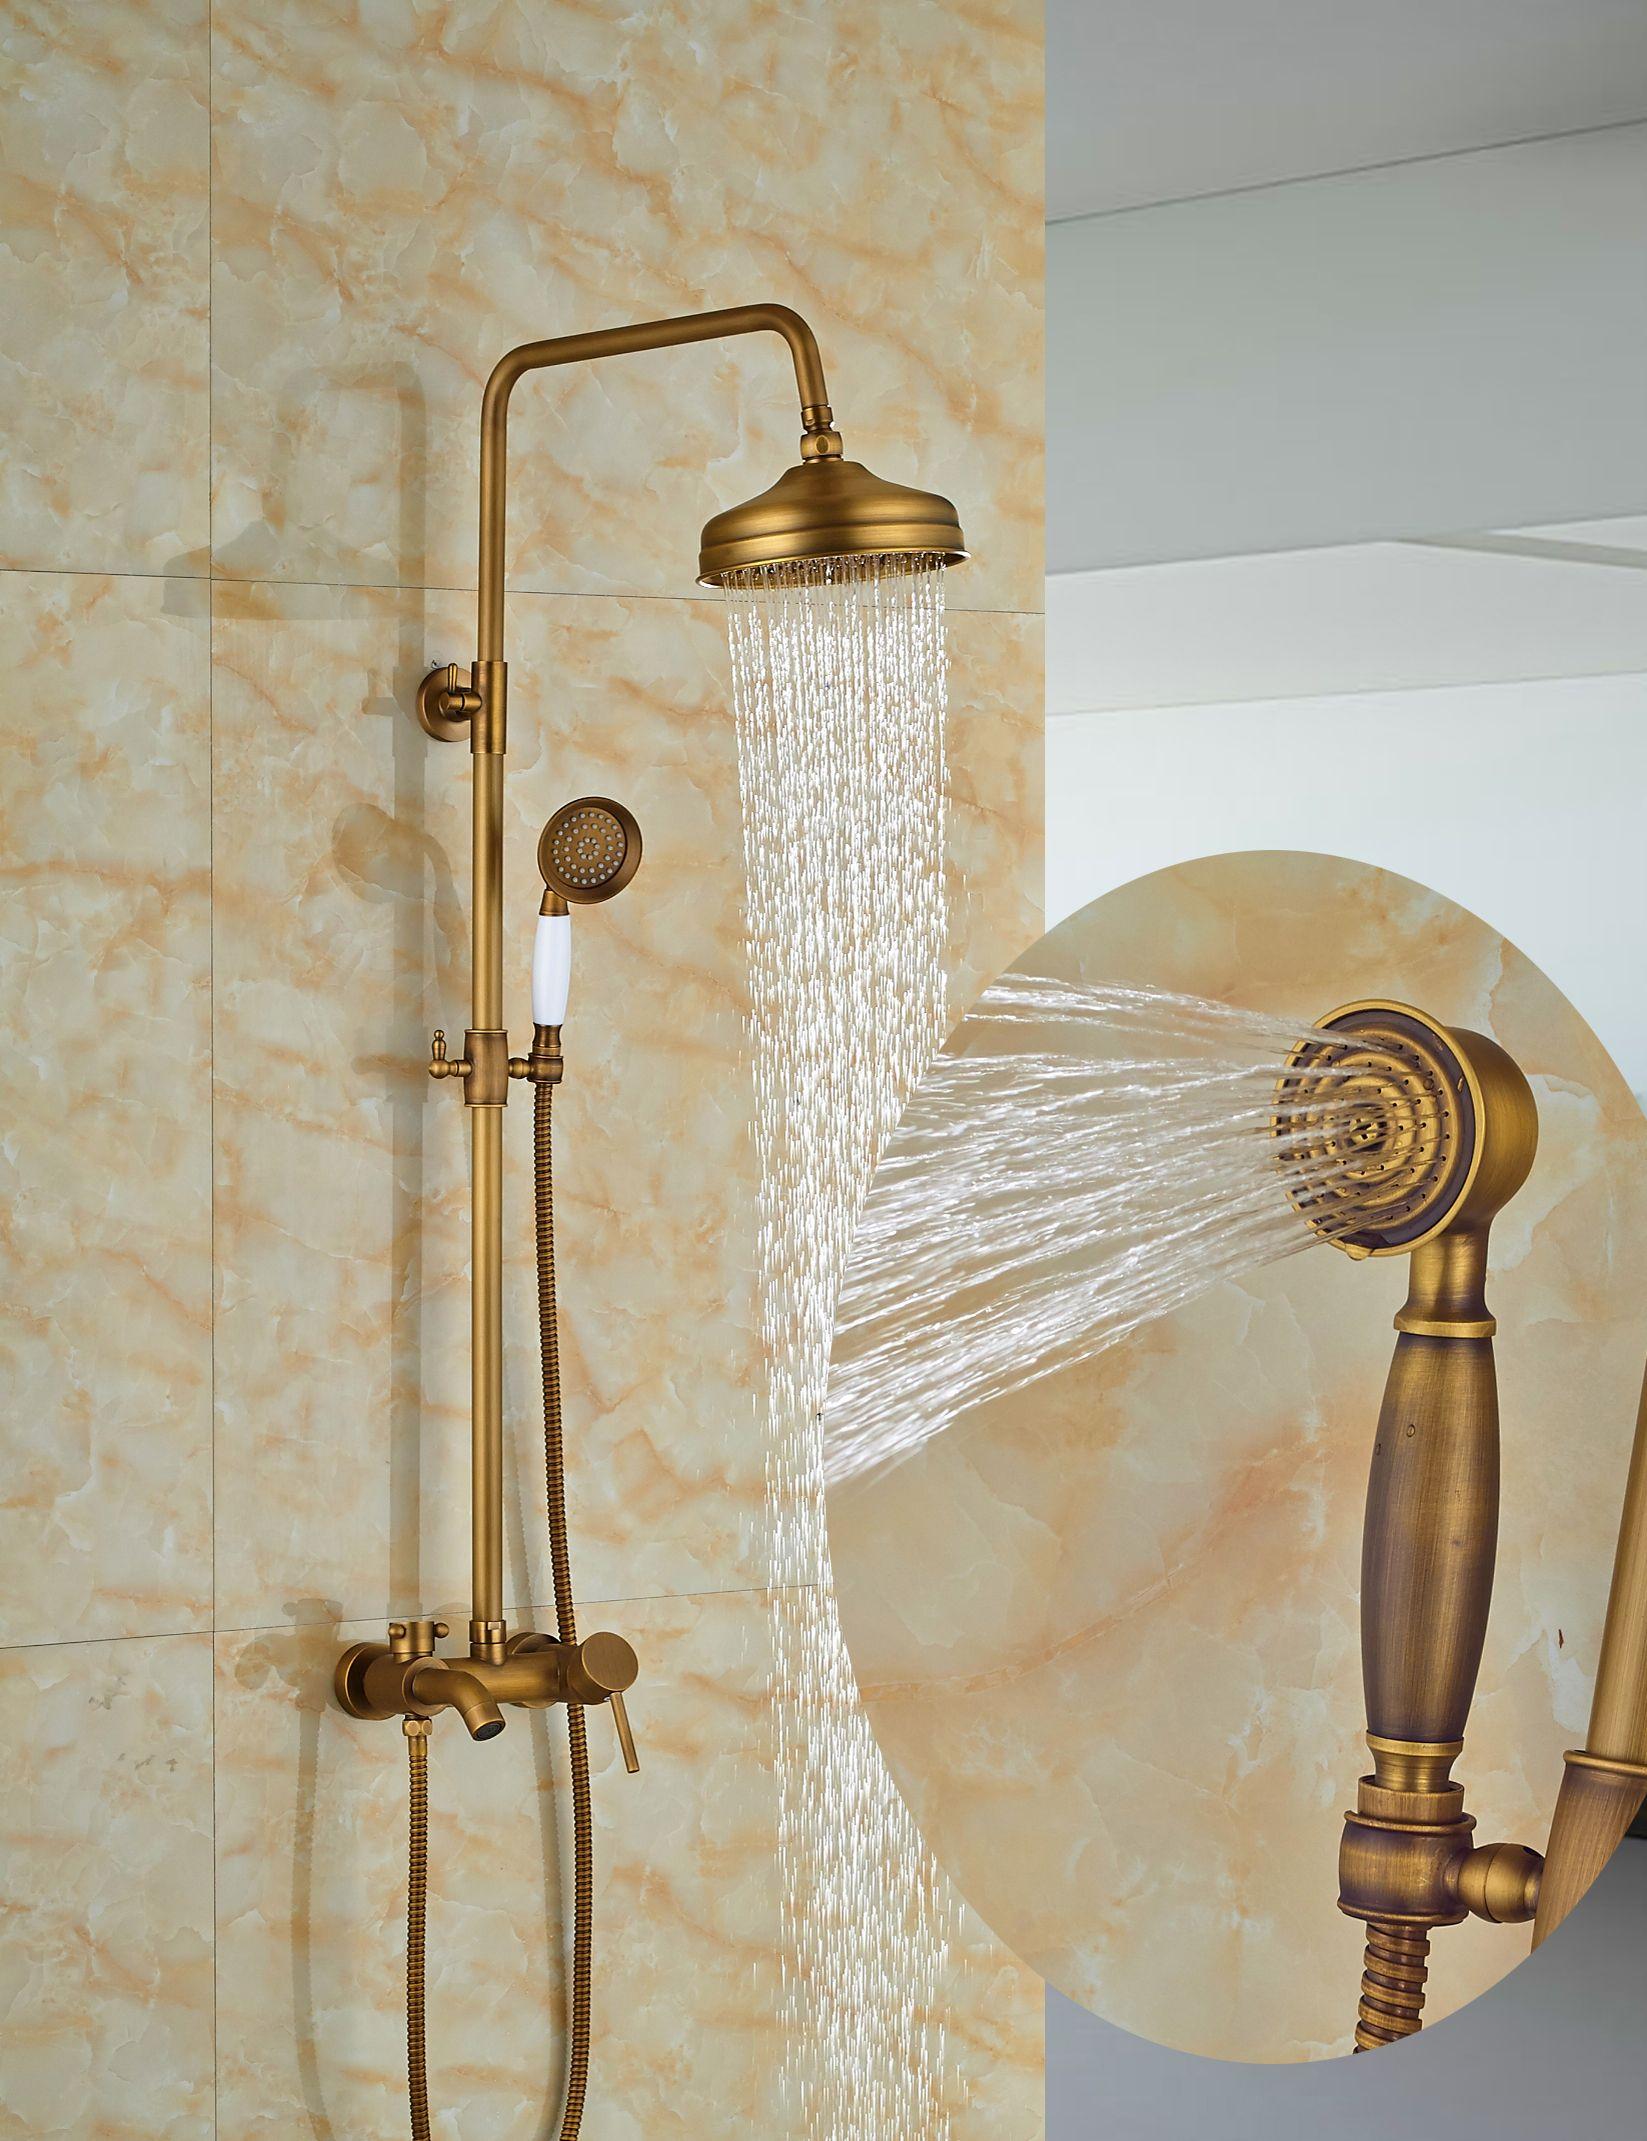 Wholesale And Retail Classic Antique Brass 8 Round Rain Shower Faucet Set Tub Spout Mixer Tap W Hand Shower Sprayer